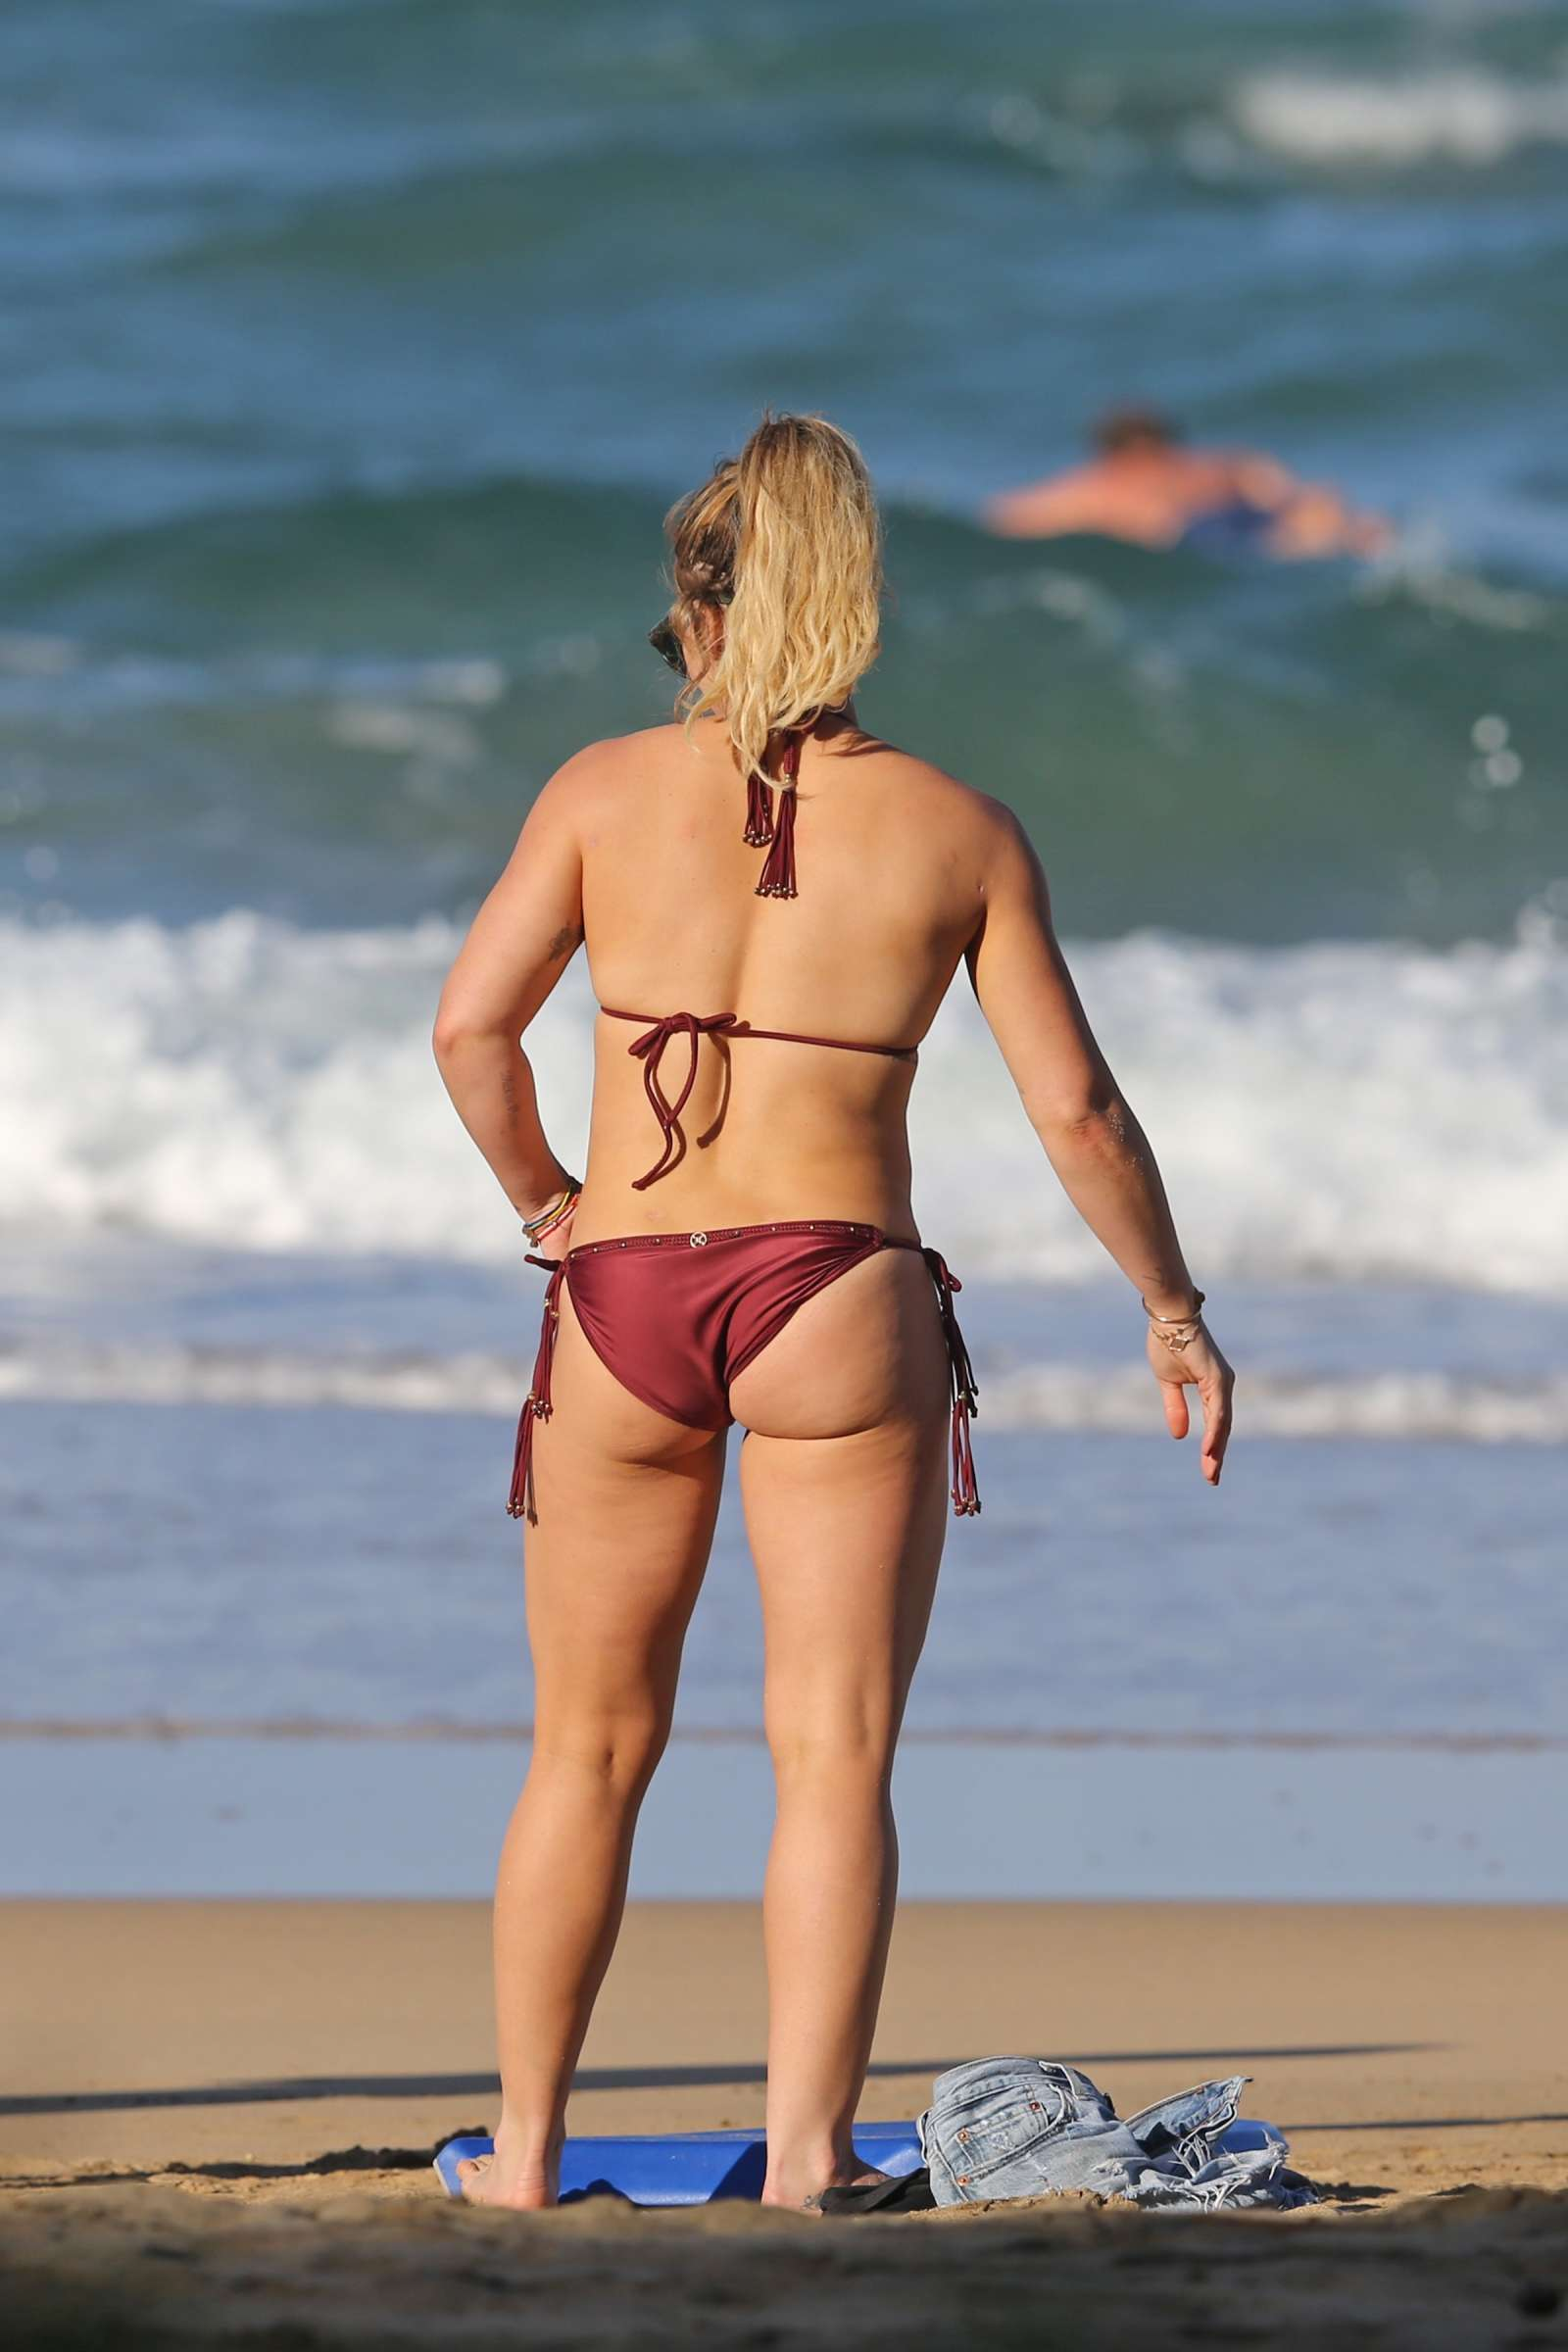 Hillary duff bikini gallery